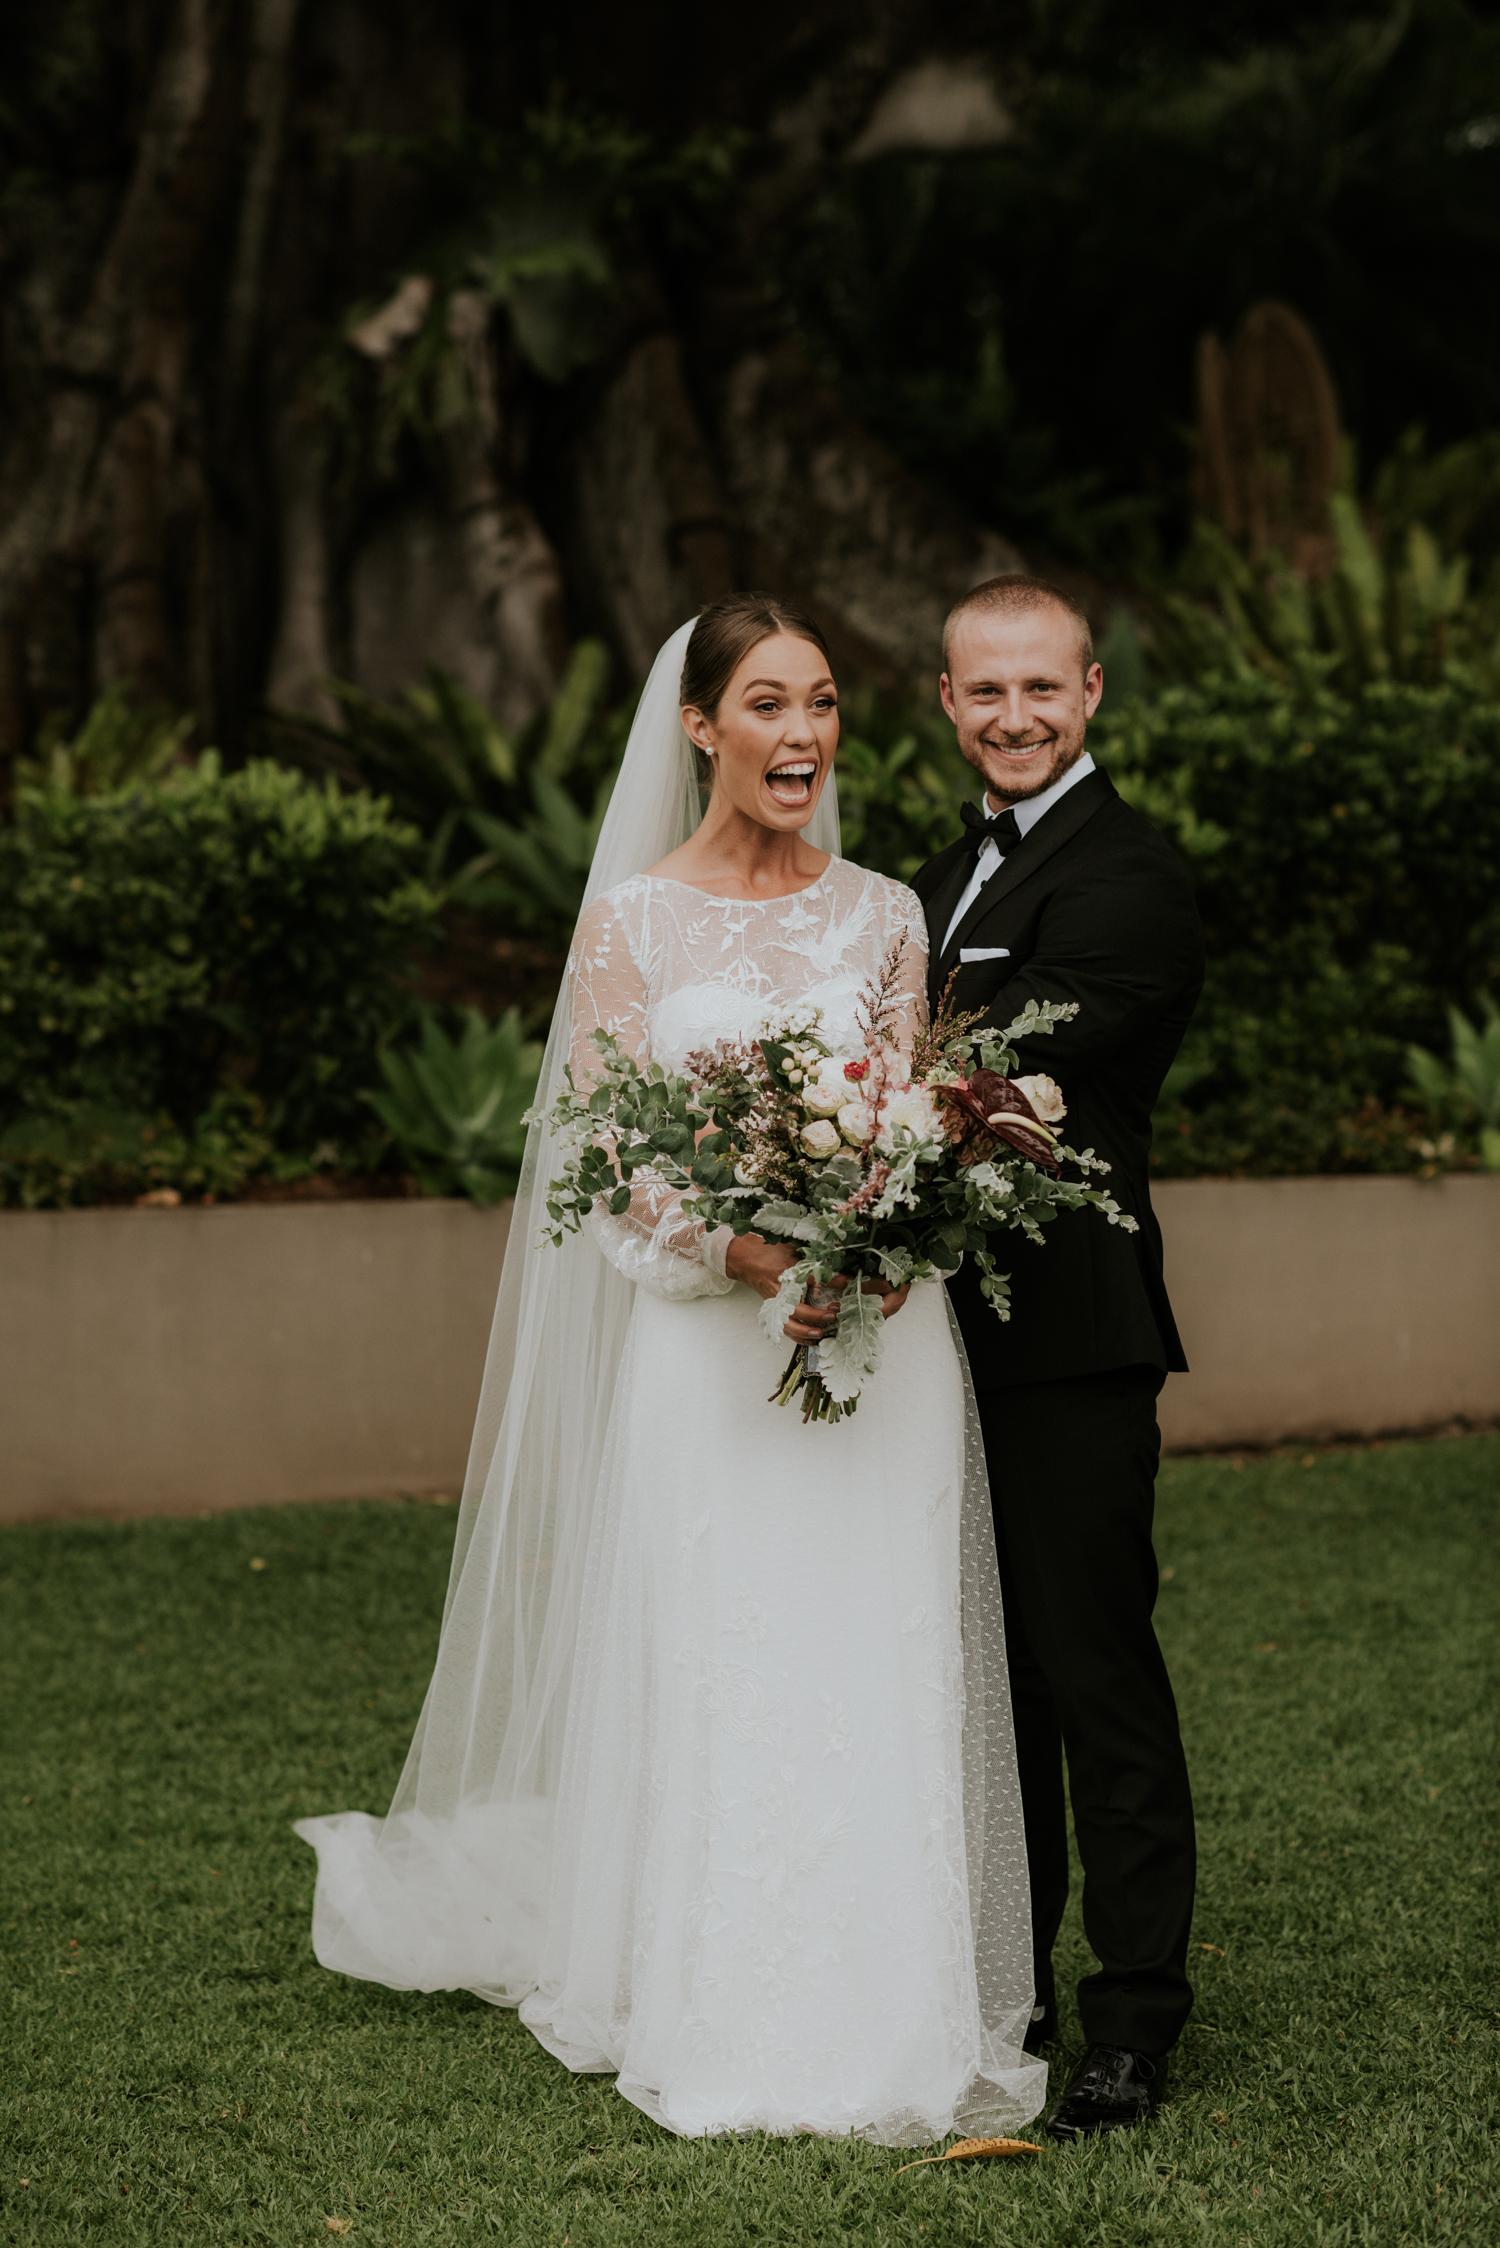 Brisbane Wedding Photographer   Engagement-Elopement Photography-66.jpg